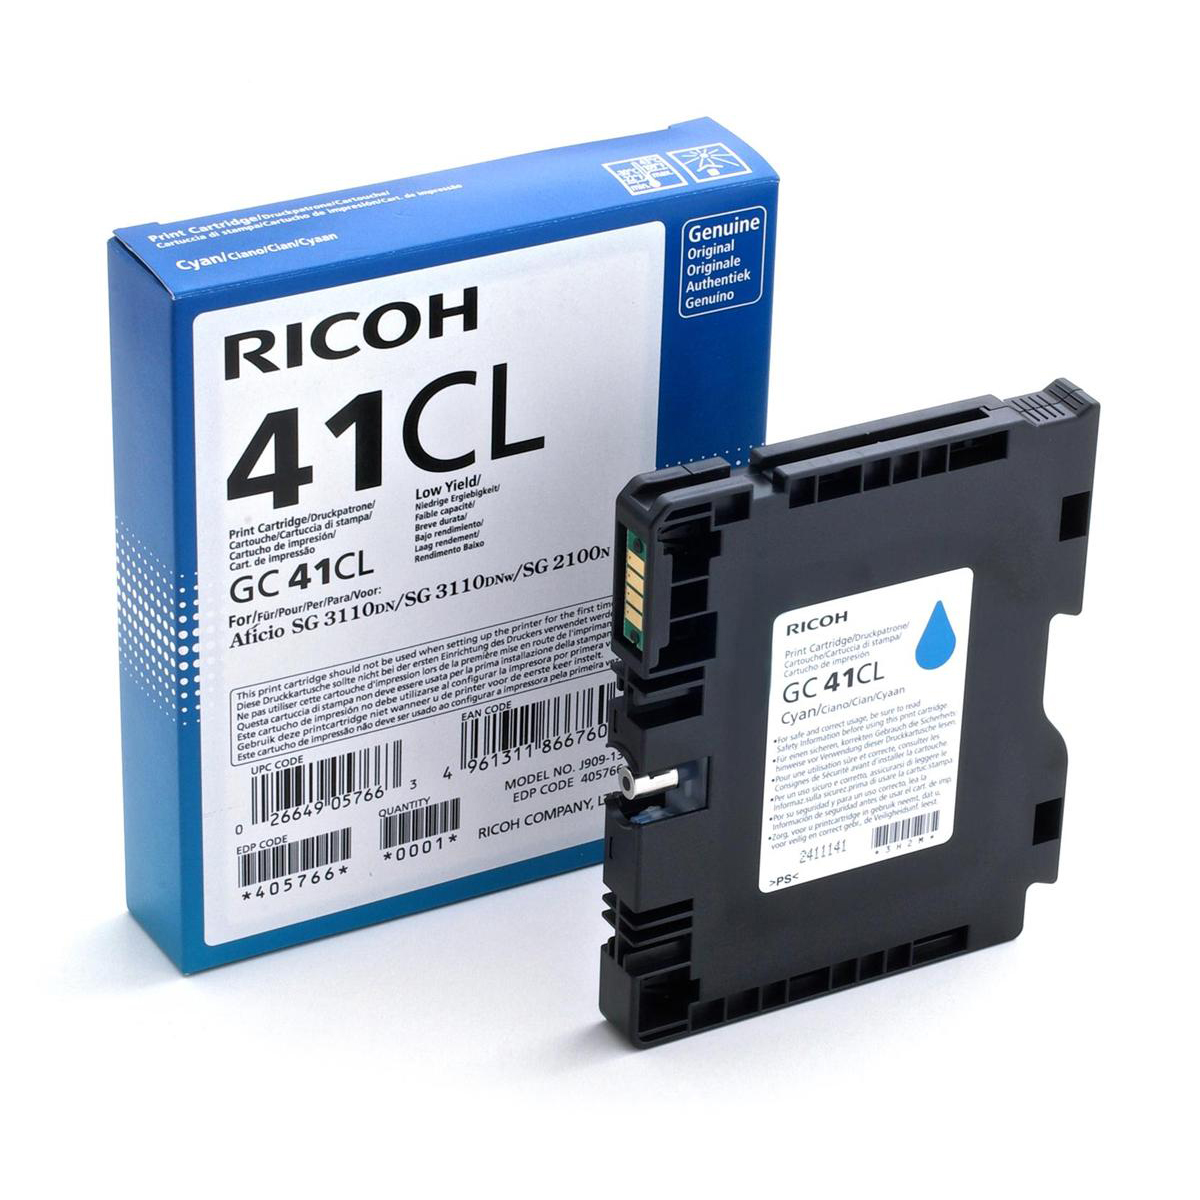 Ricoh GC-41 Toner Cartridge Page Life 600pp Cyan Ref 405766